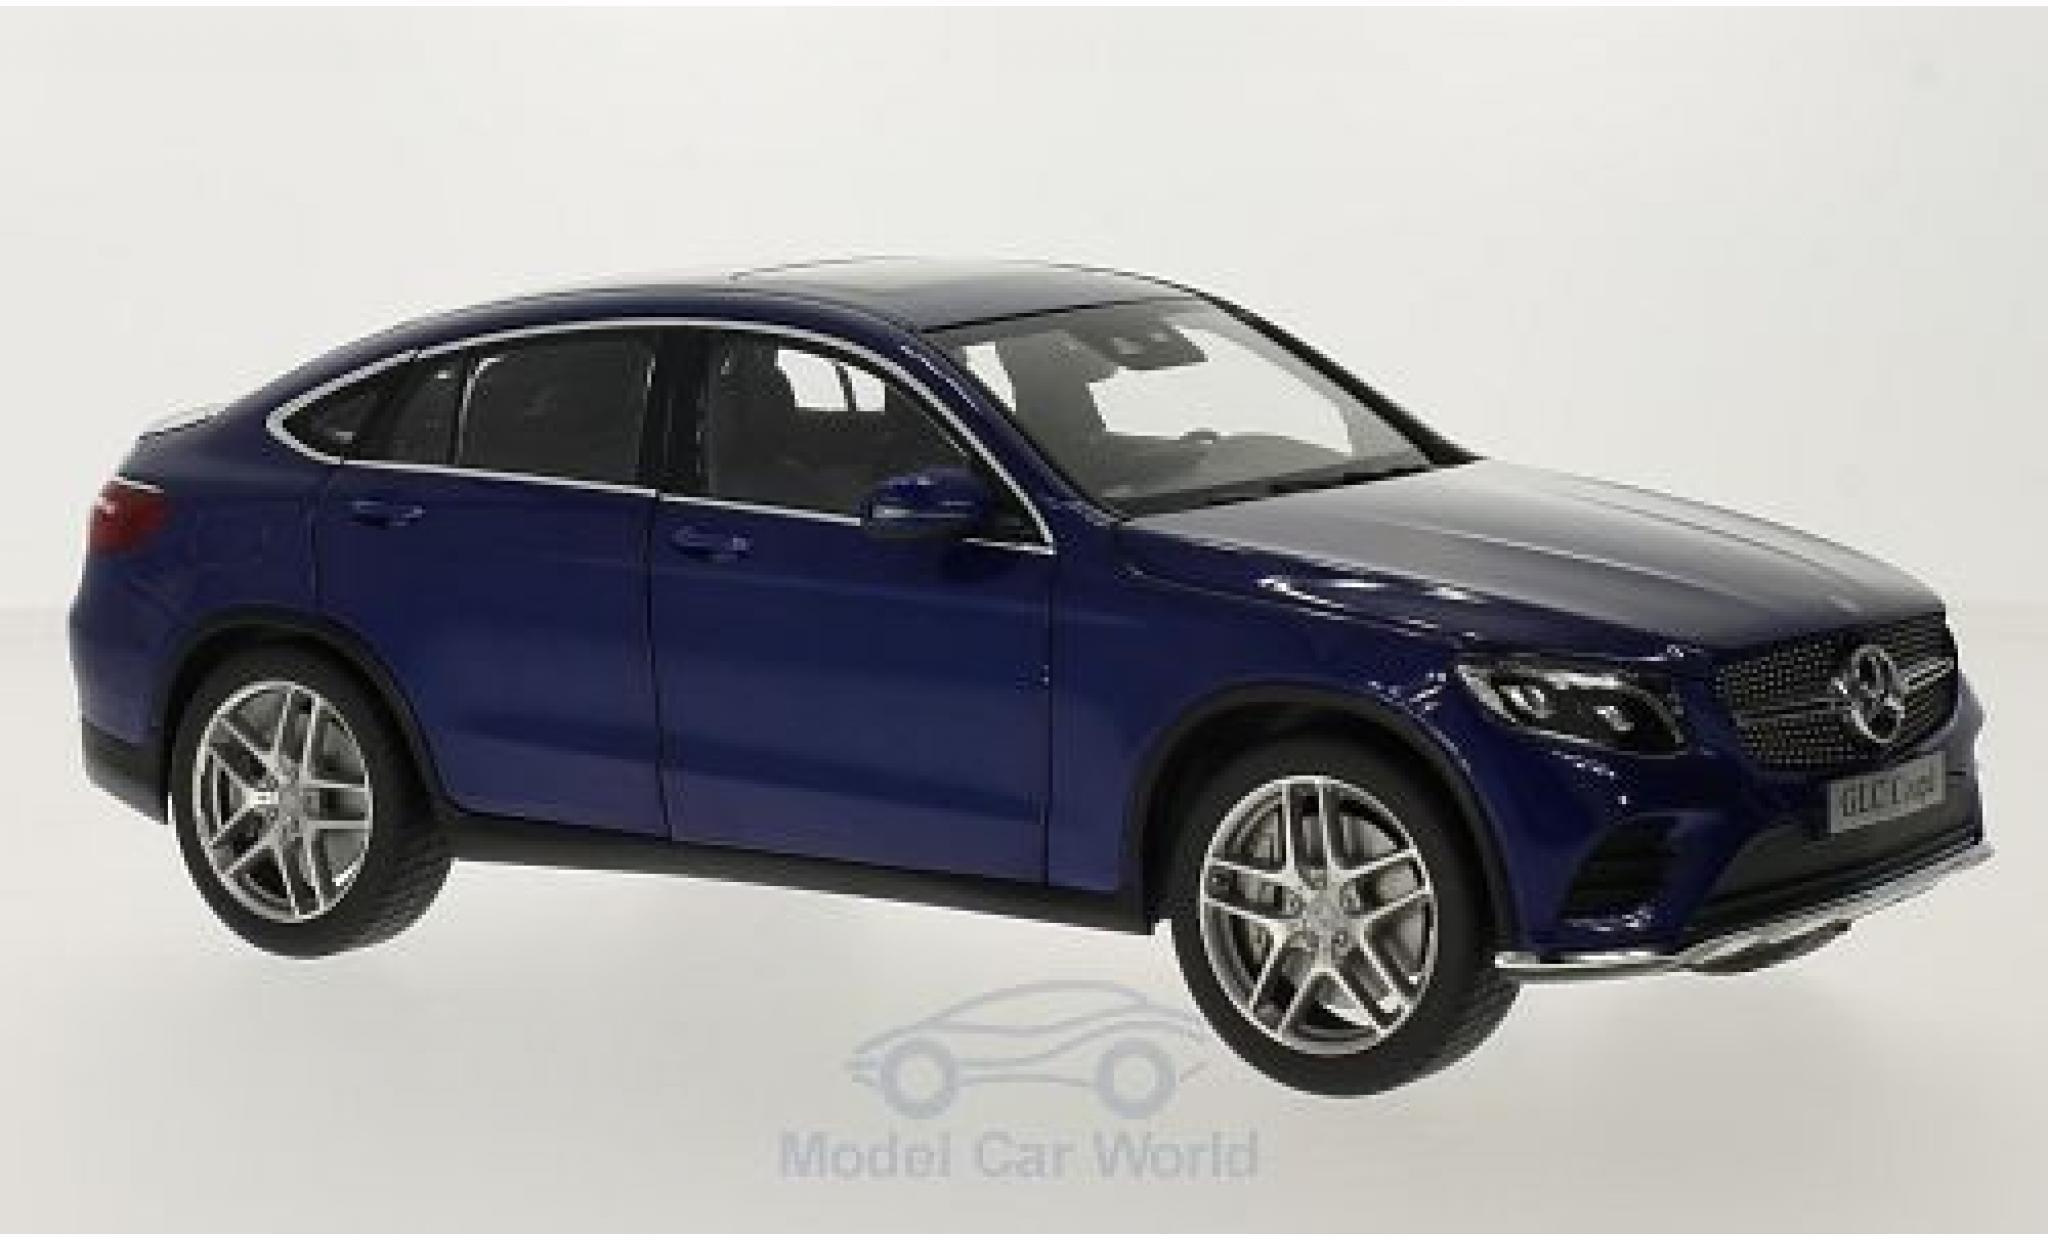 Mercedes Classe GLC 1/18 iScale GLC Coupe (C253) metallise bleue